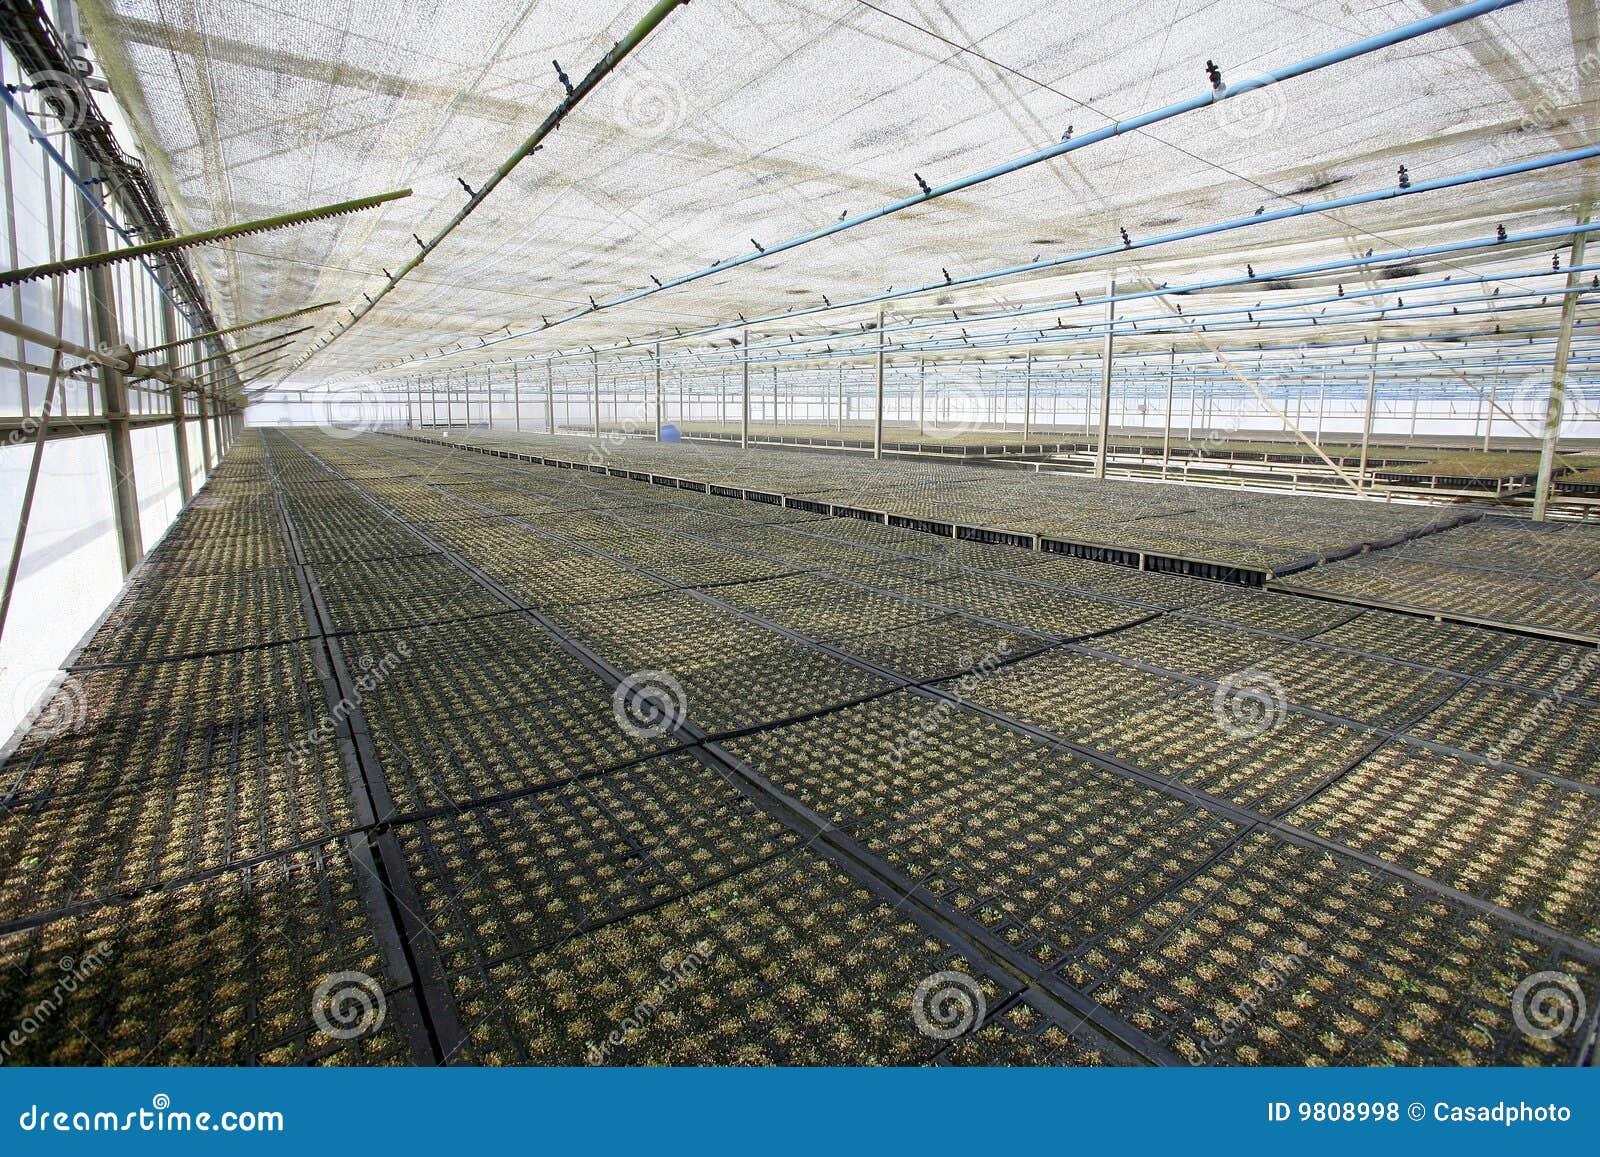 cassava plantation business plan